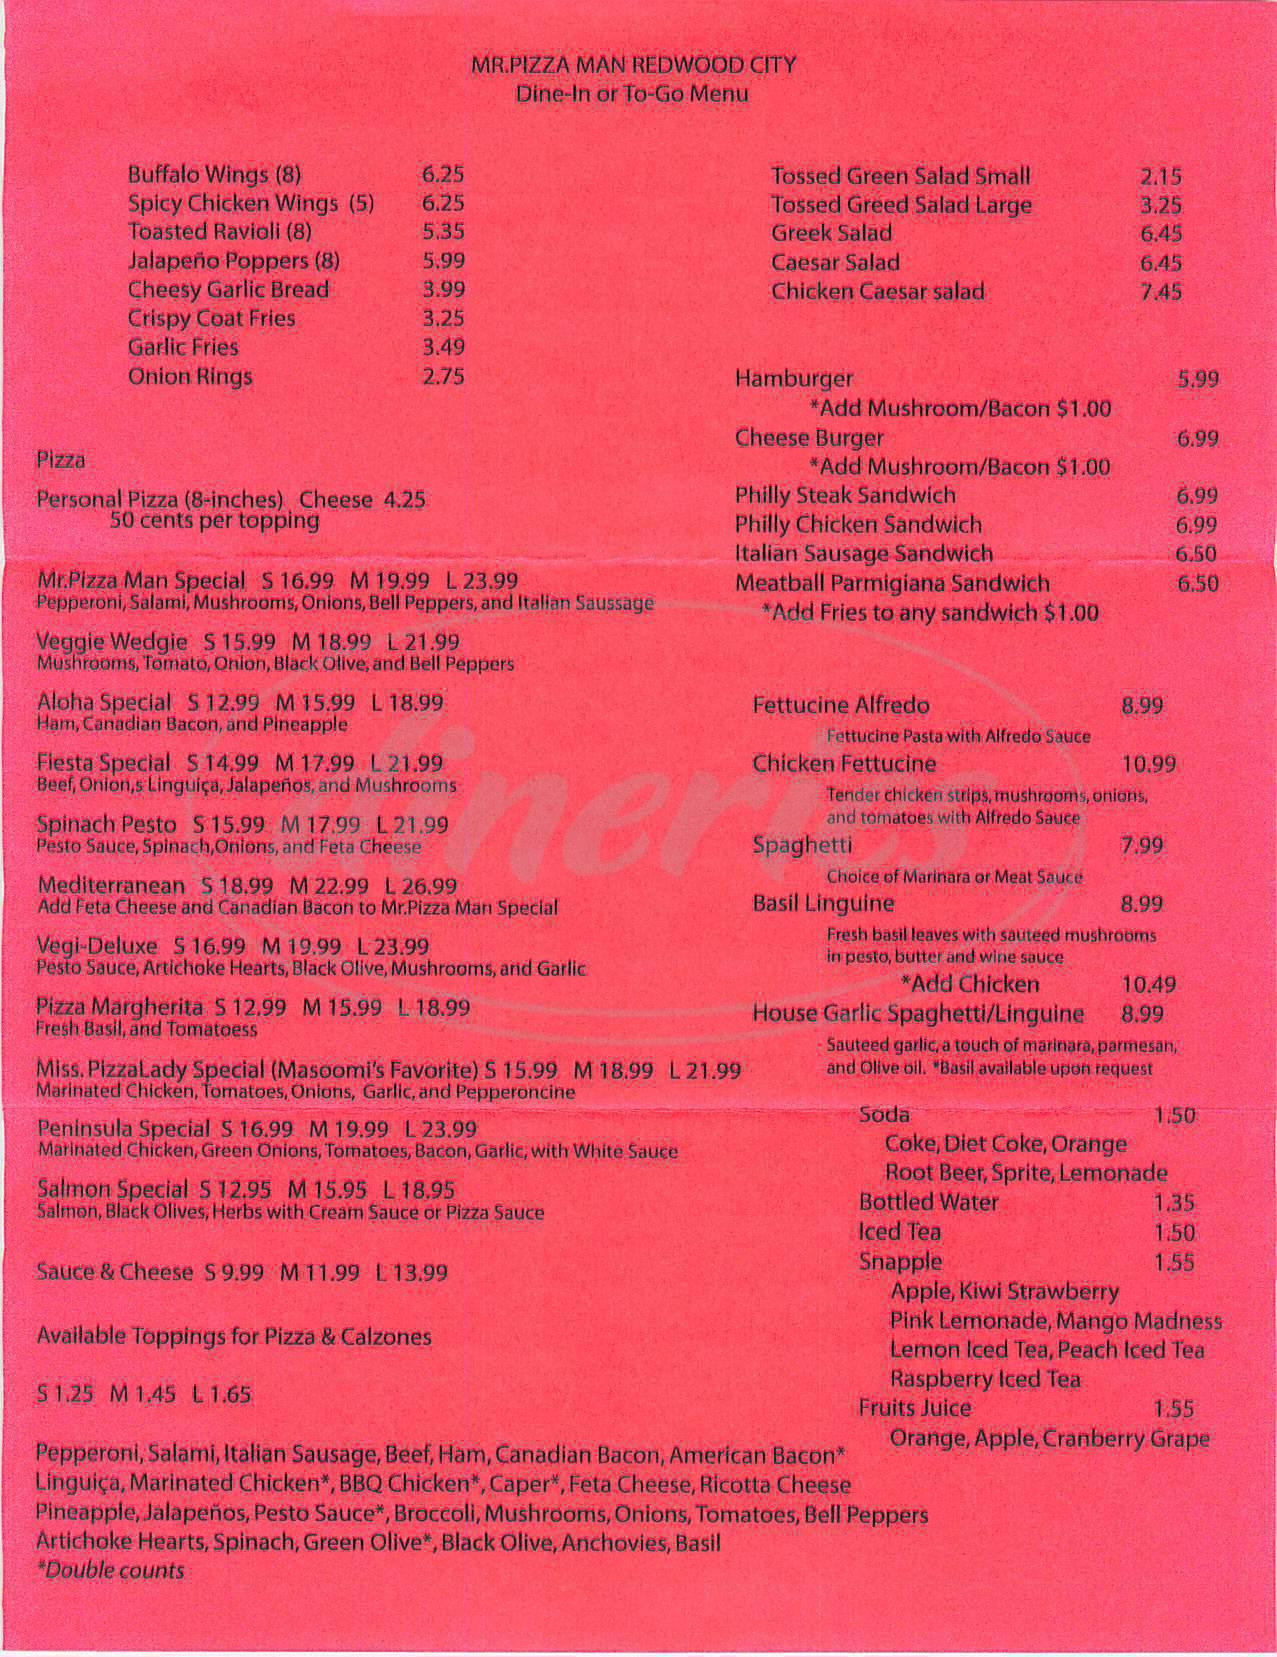 menu for Mr. Pizza Man